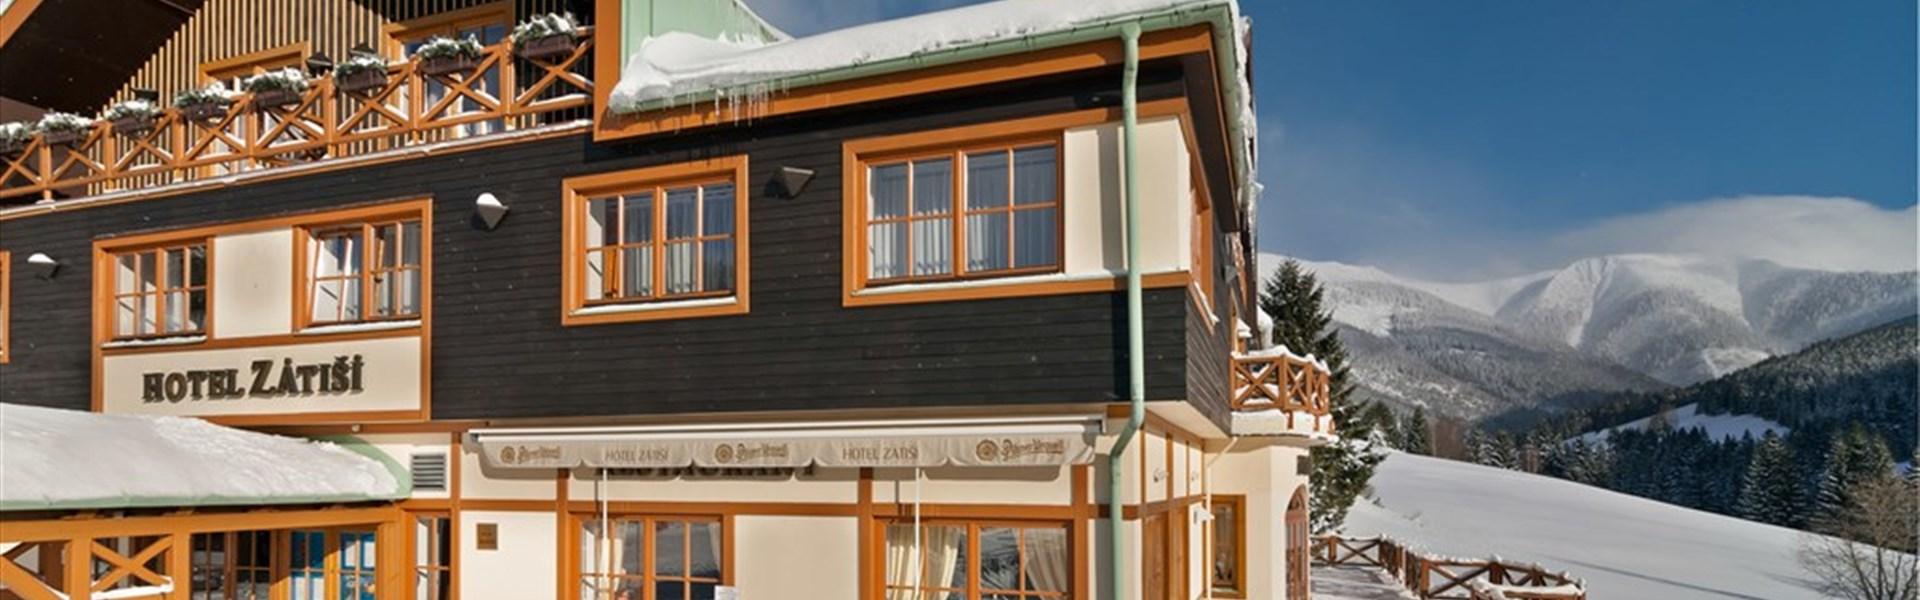 Marco Polo - Hotel Zátiší - zima -